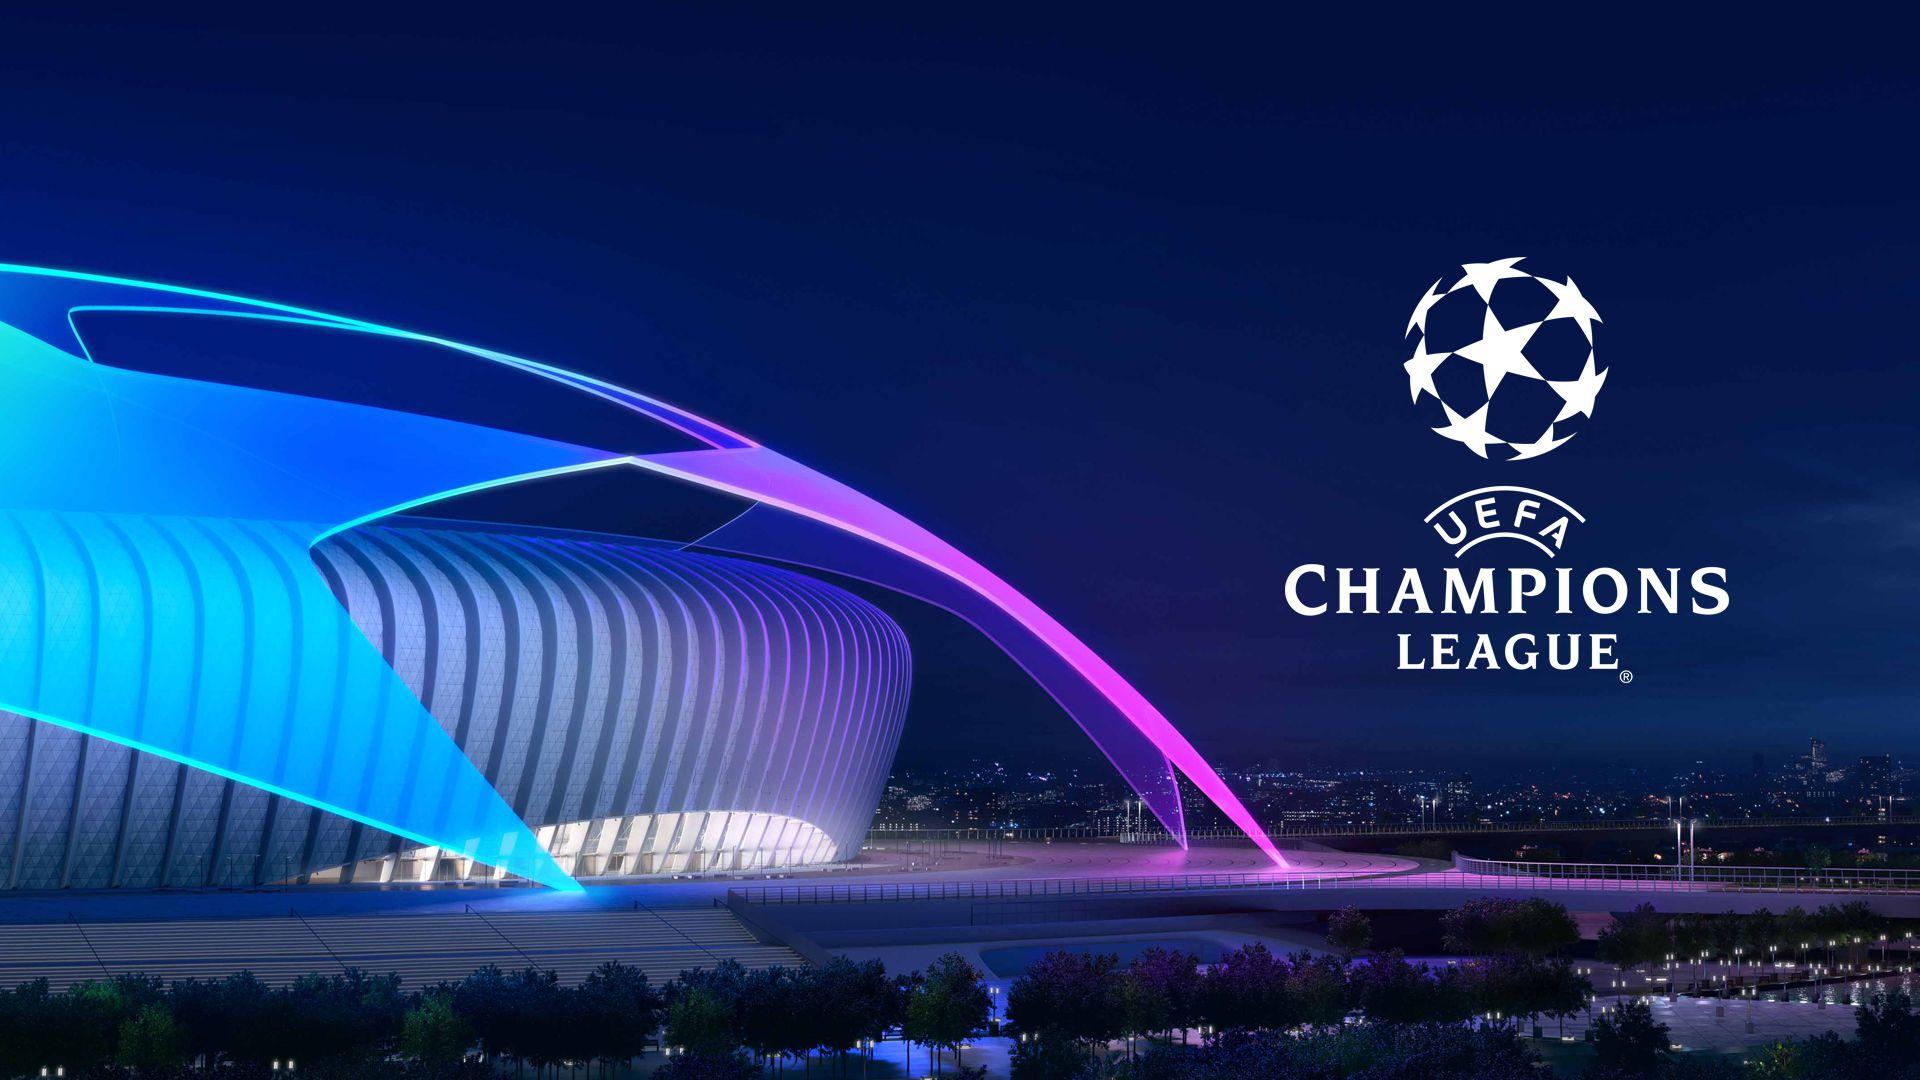 uefa-champions-league-rebranding-2018-2021-7.jpg